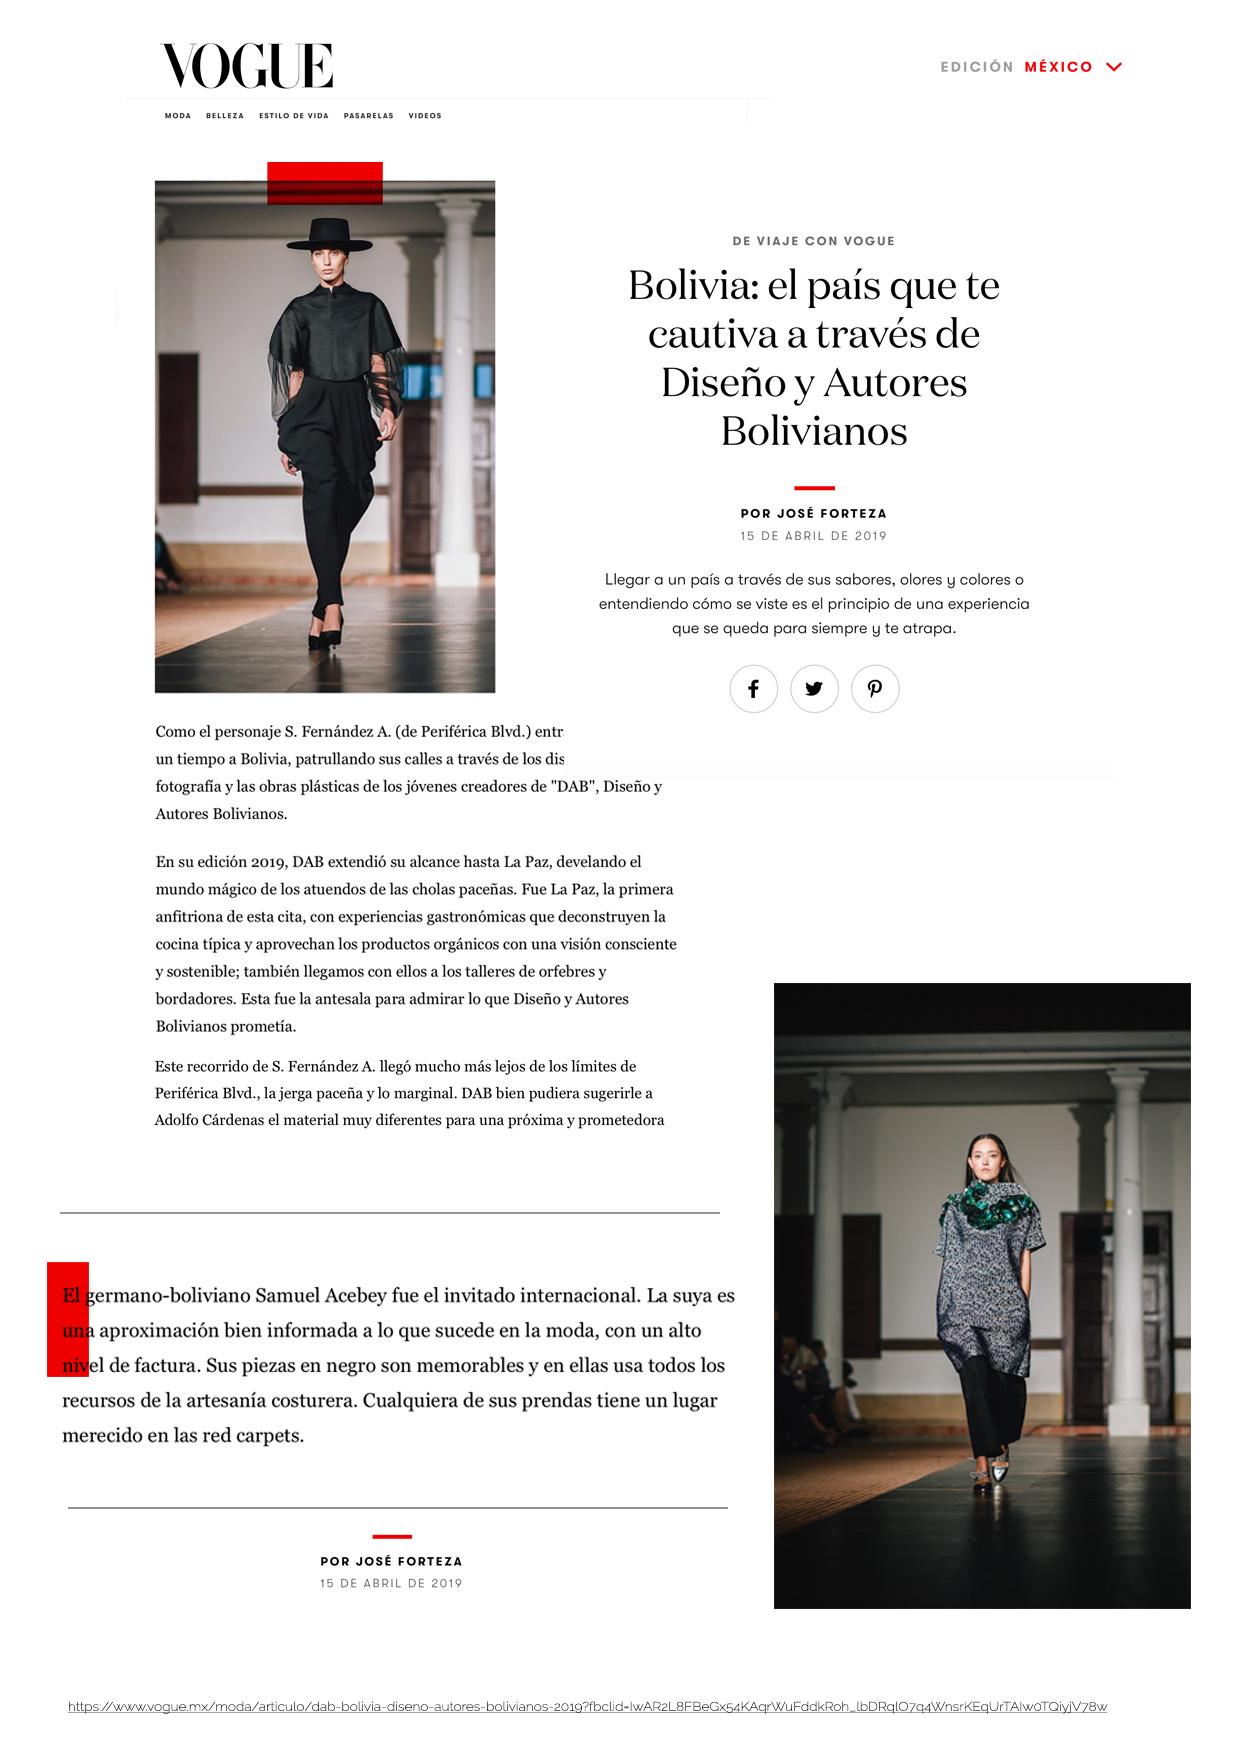 https://www.vogue.mx/moda/articulo/dab-bolivia-diseno-autores-bolivianos-2019?fbclid=IwAR2L8FBeGx54KAqrWuFddkRoh_lbDRqlO7q4WnsrKEqUrTAIw0TQiyjV78w